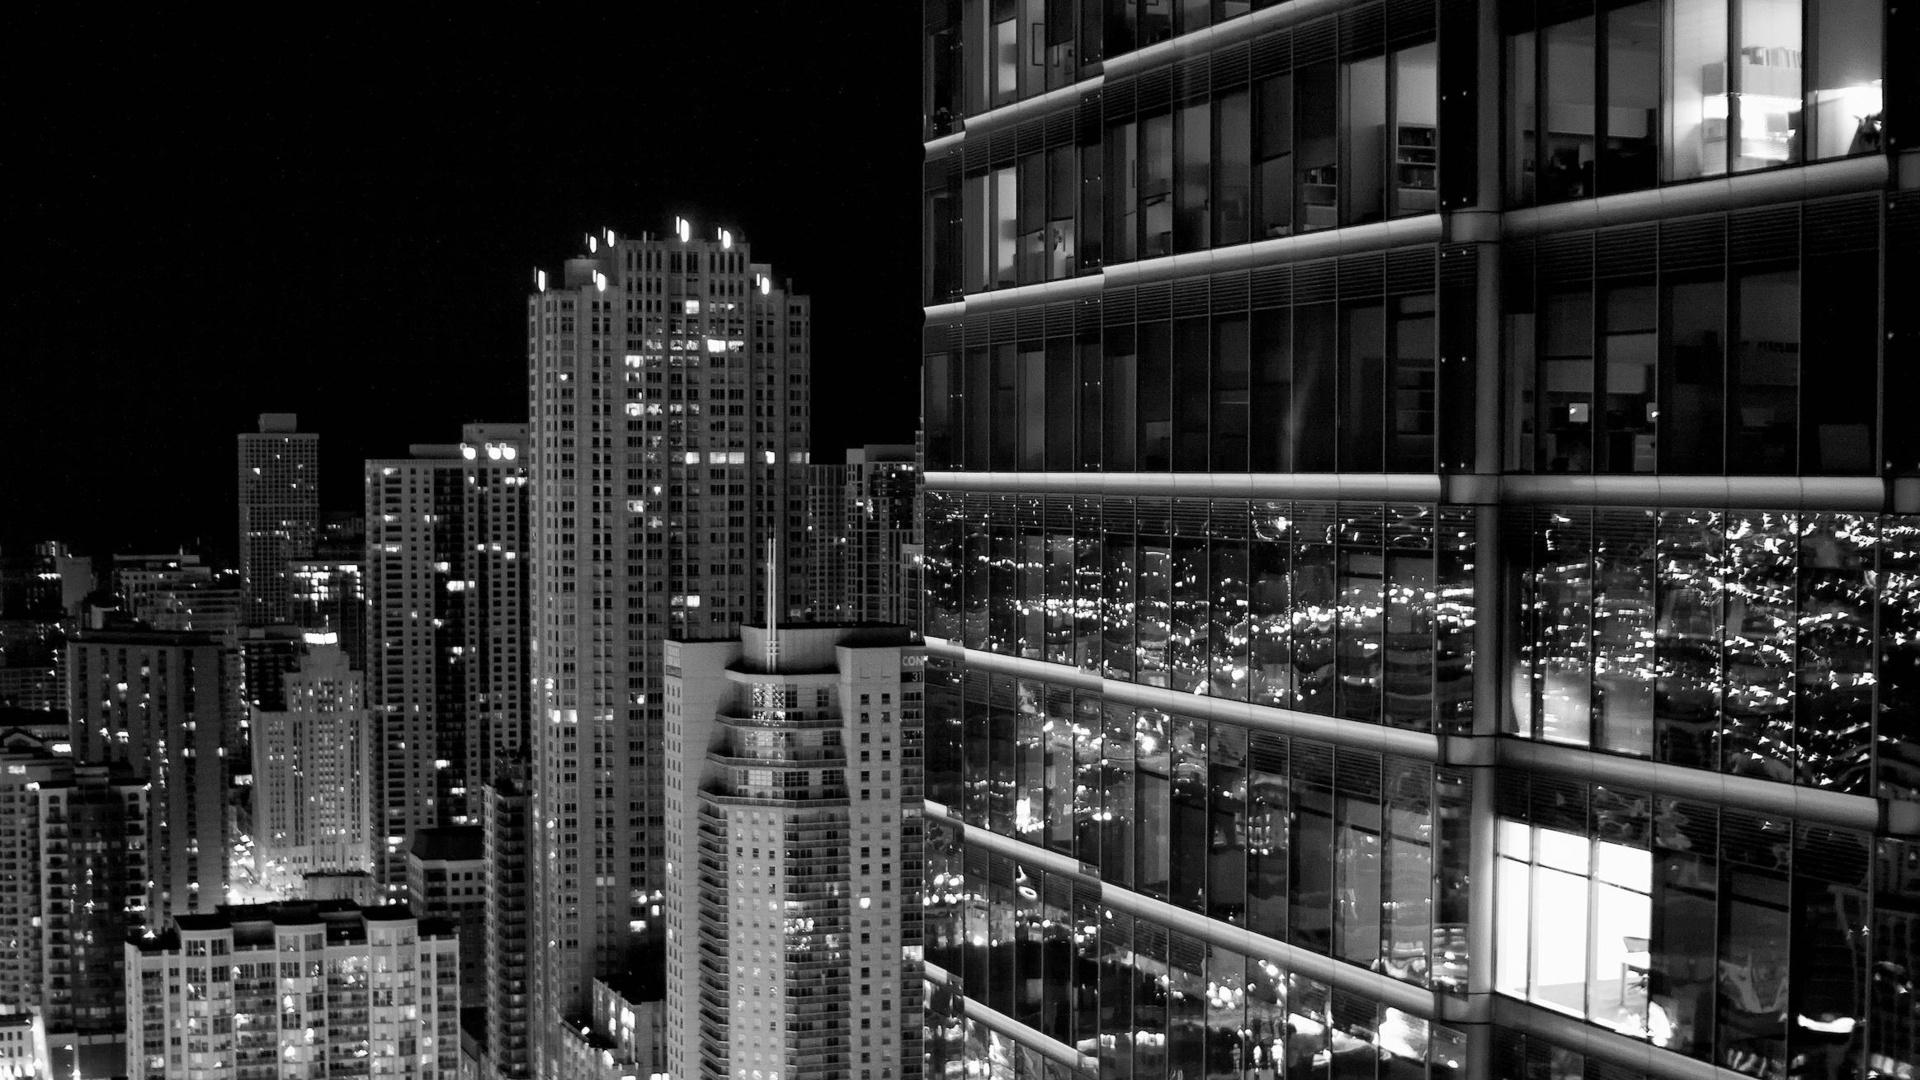 Download wallpaper 1920x1080 skyscraper city black white full hd skyscraper city black white voltagebd Image collections